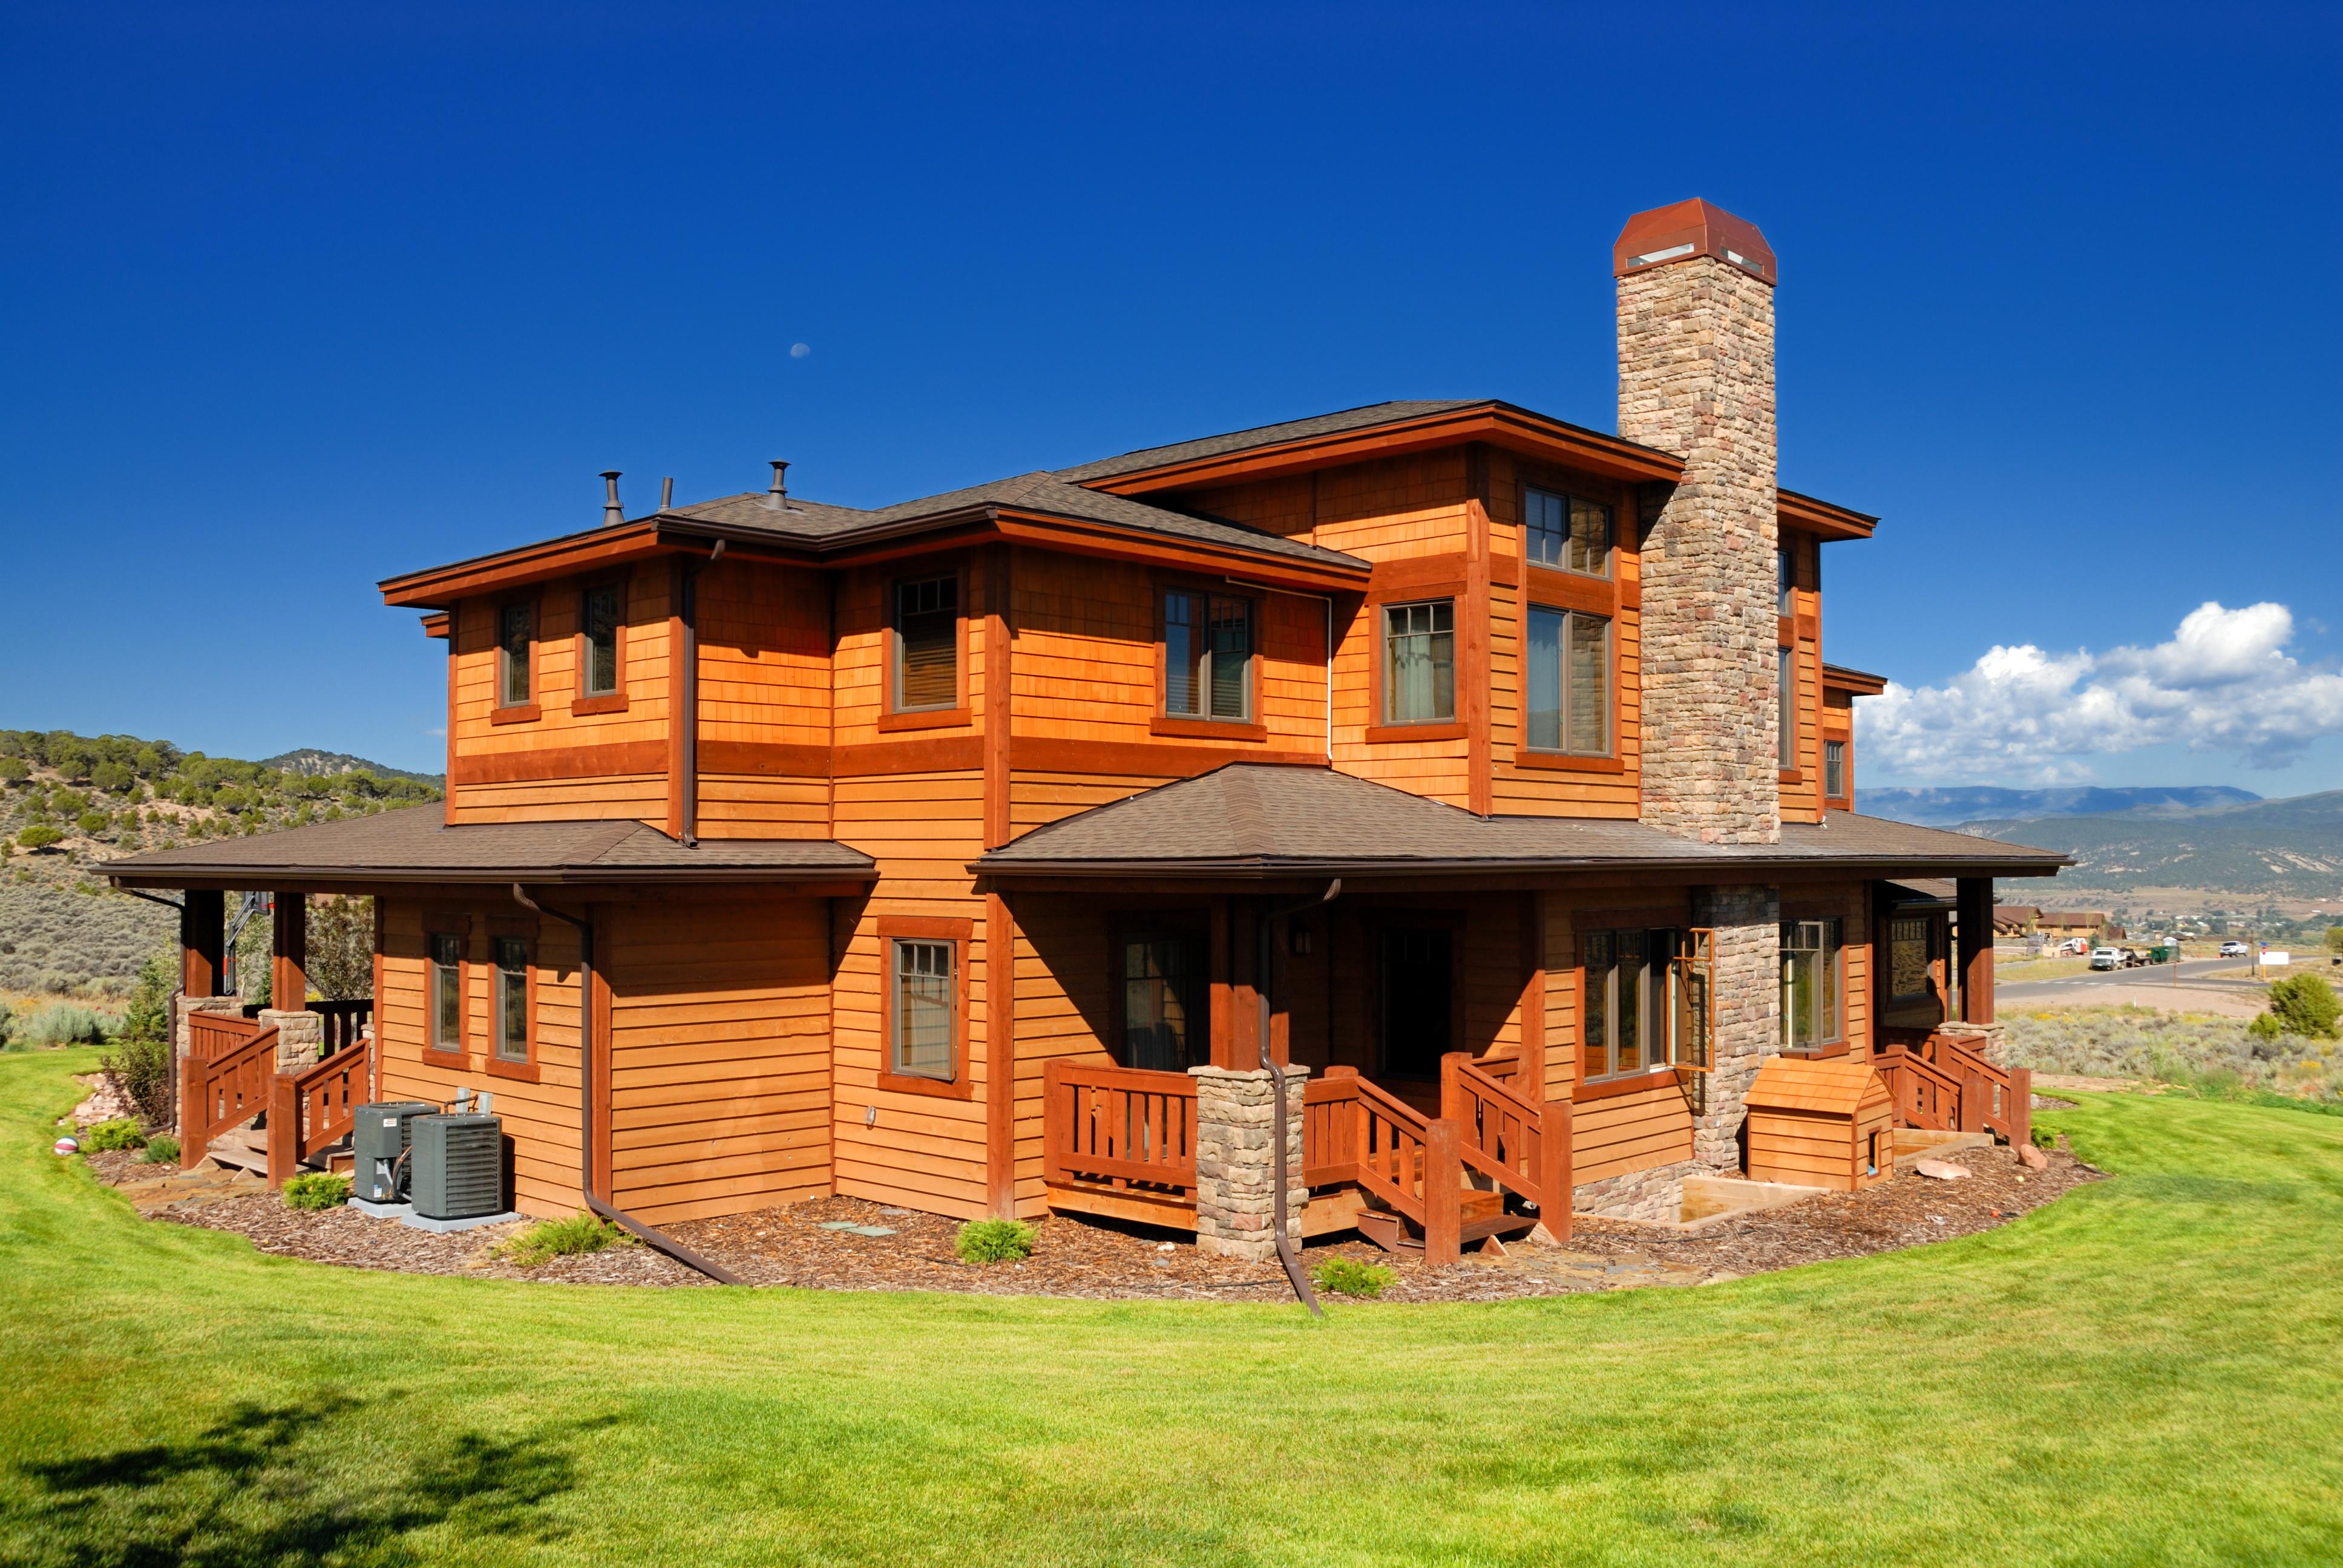 HomeSmart Property Listing